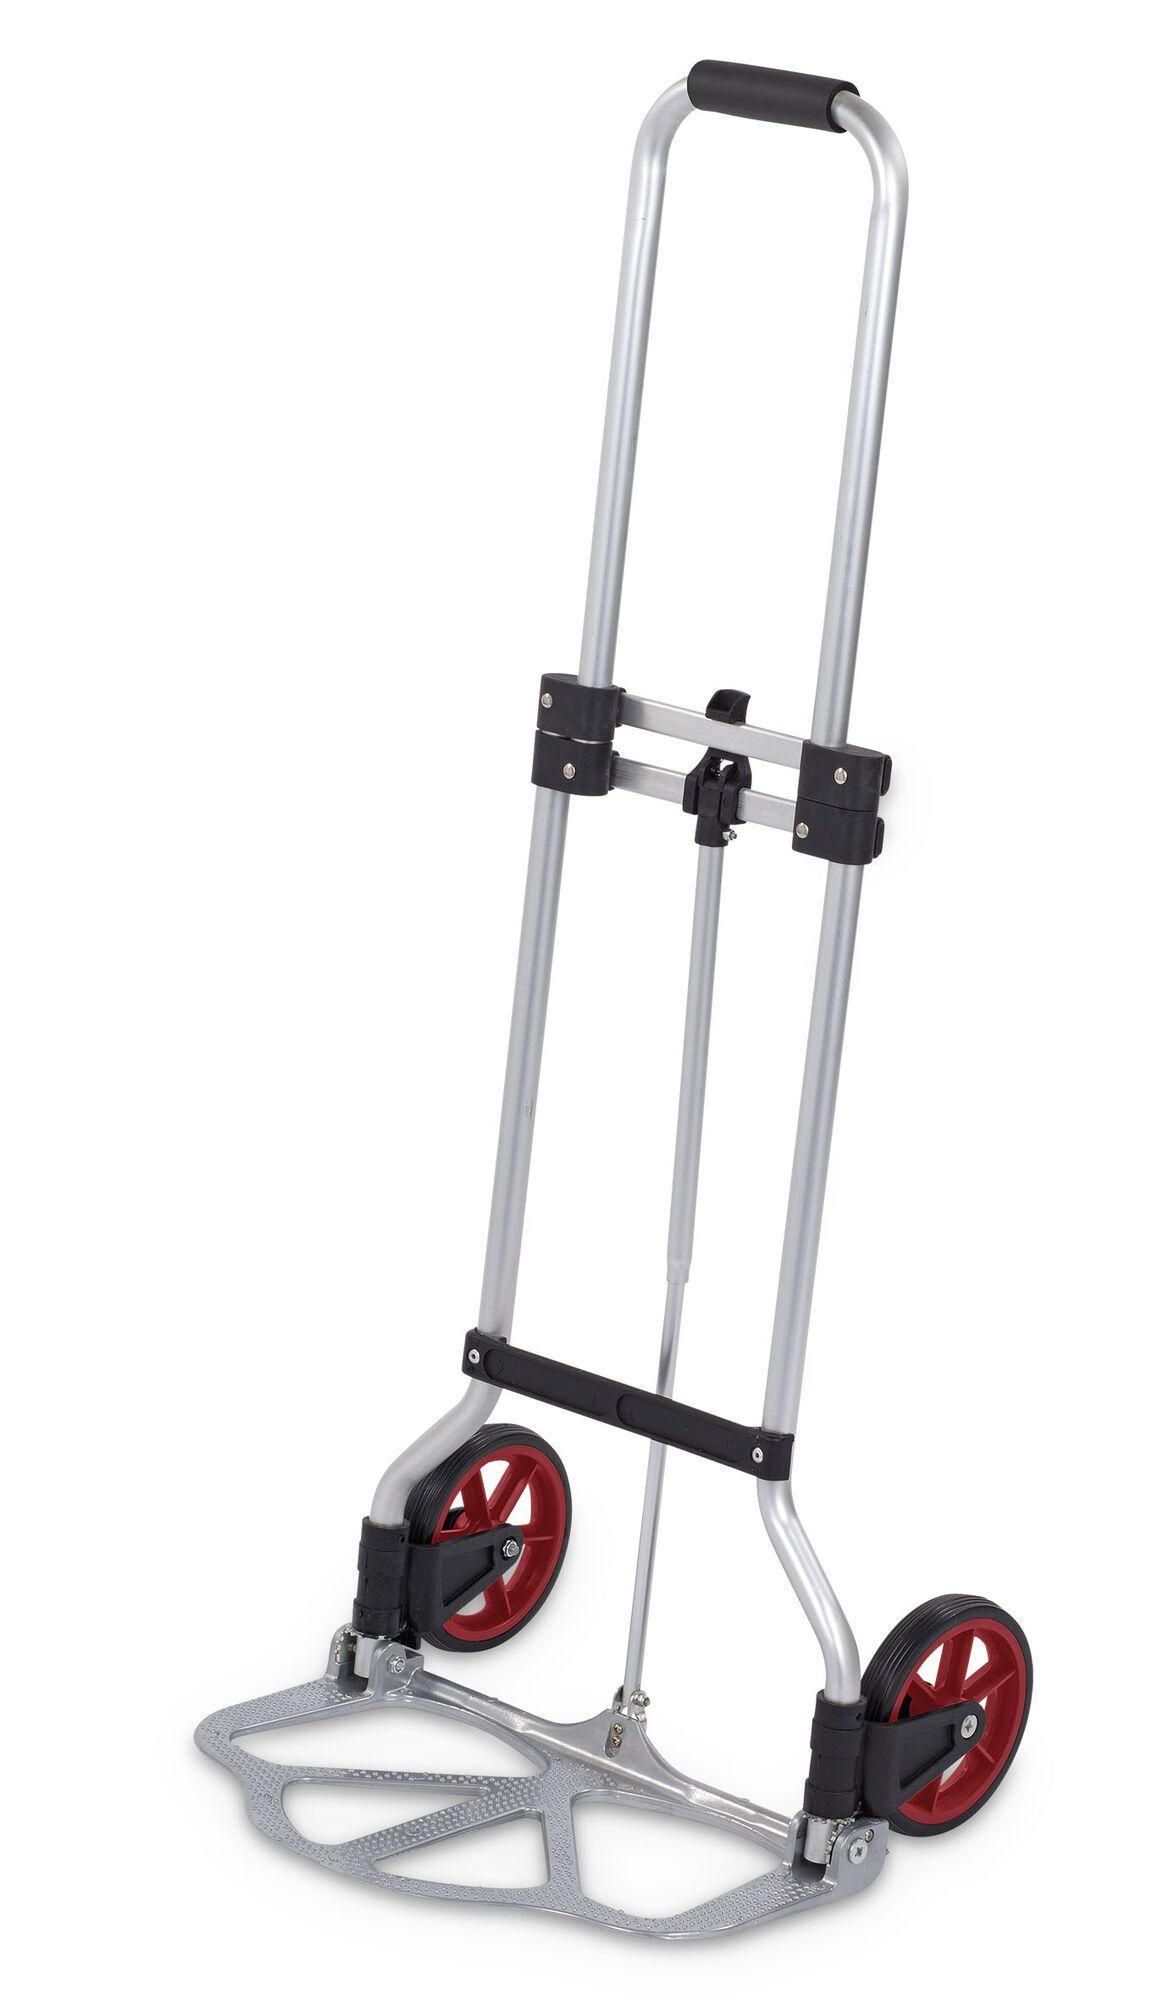 Kreator KRT670202 Opvouwbare steekwagen 45kg | Aluminium inklapbare steekkar